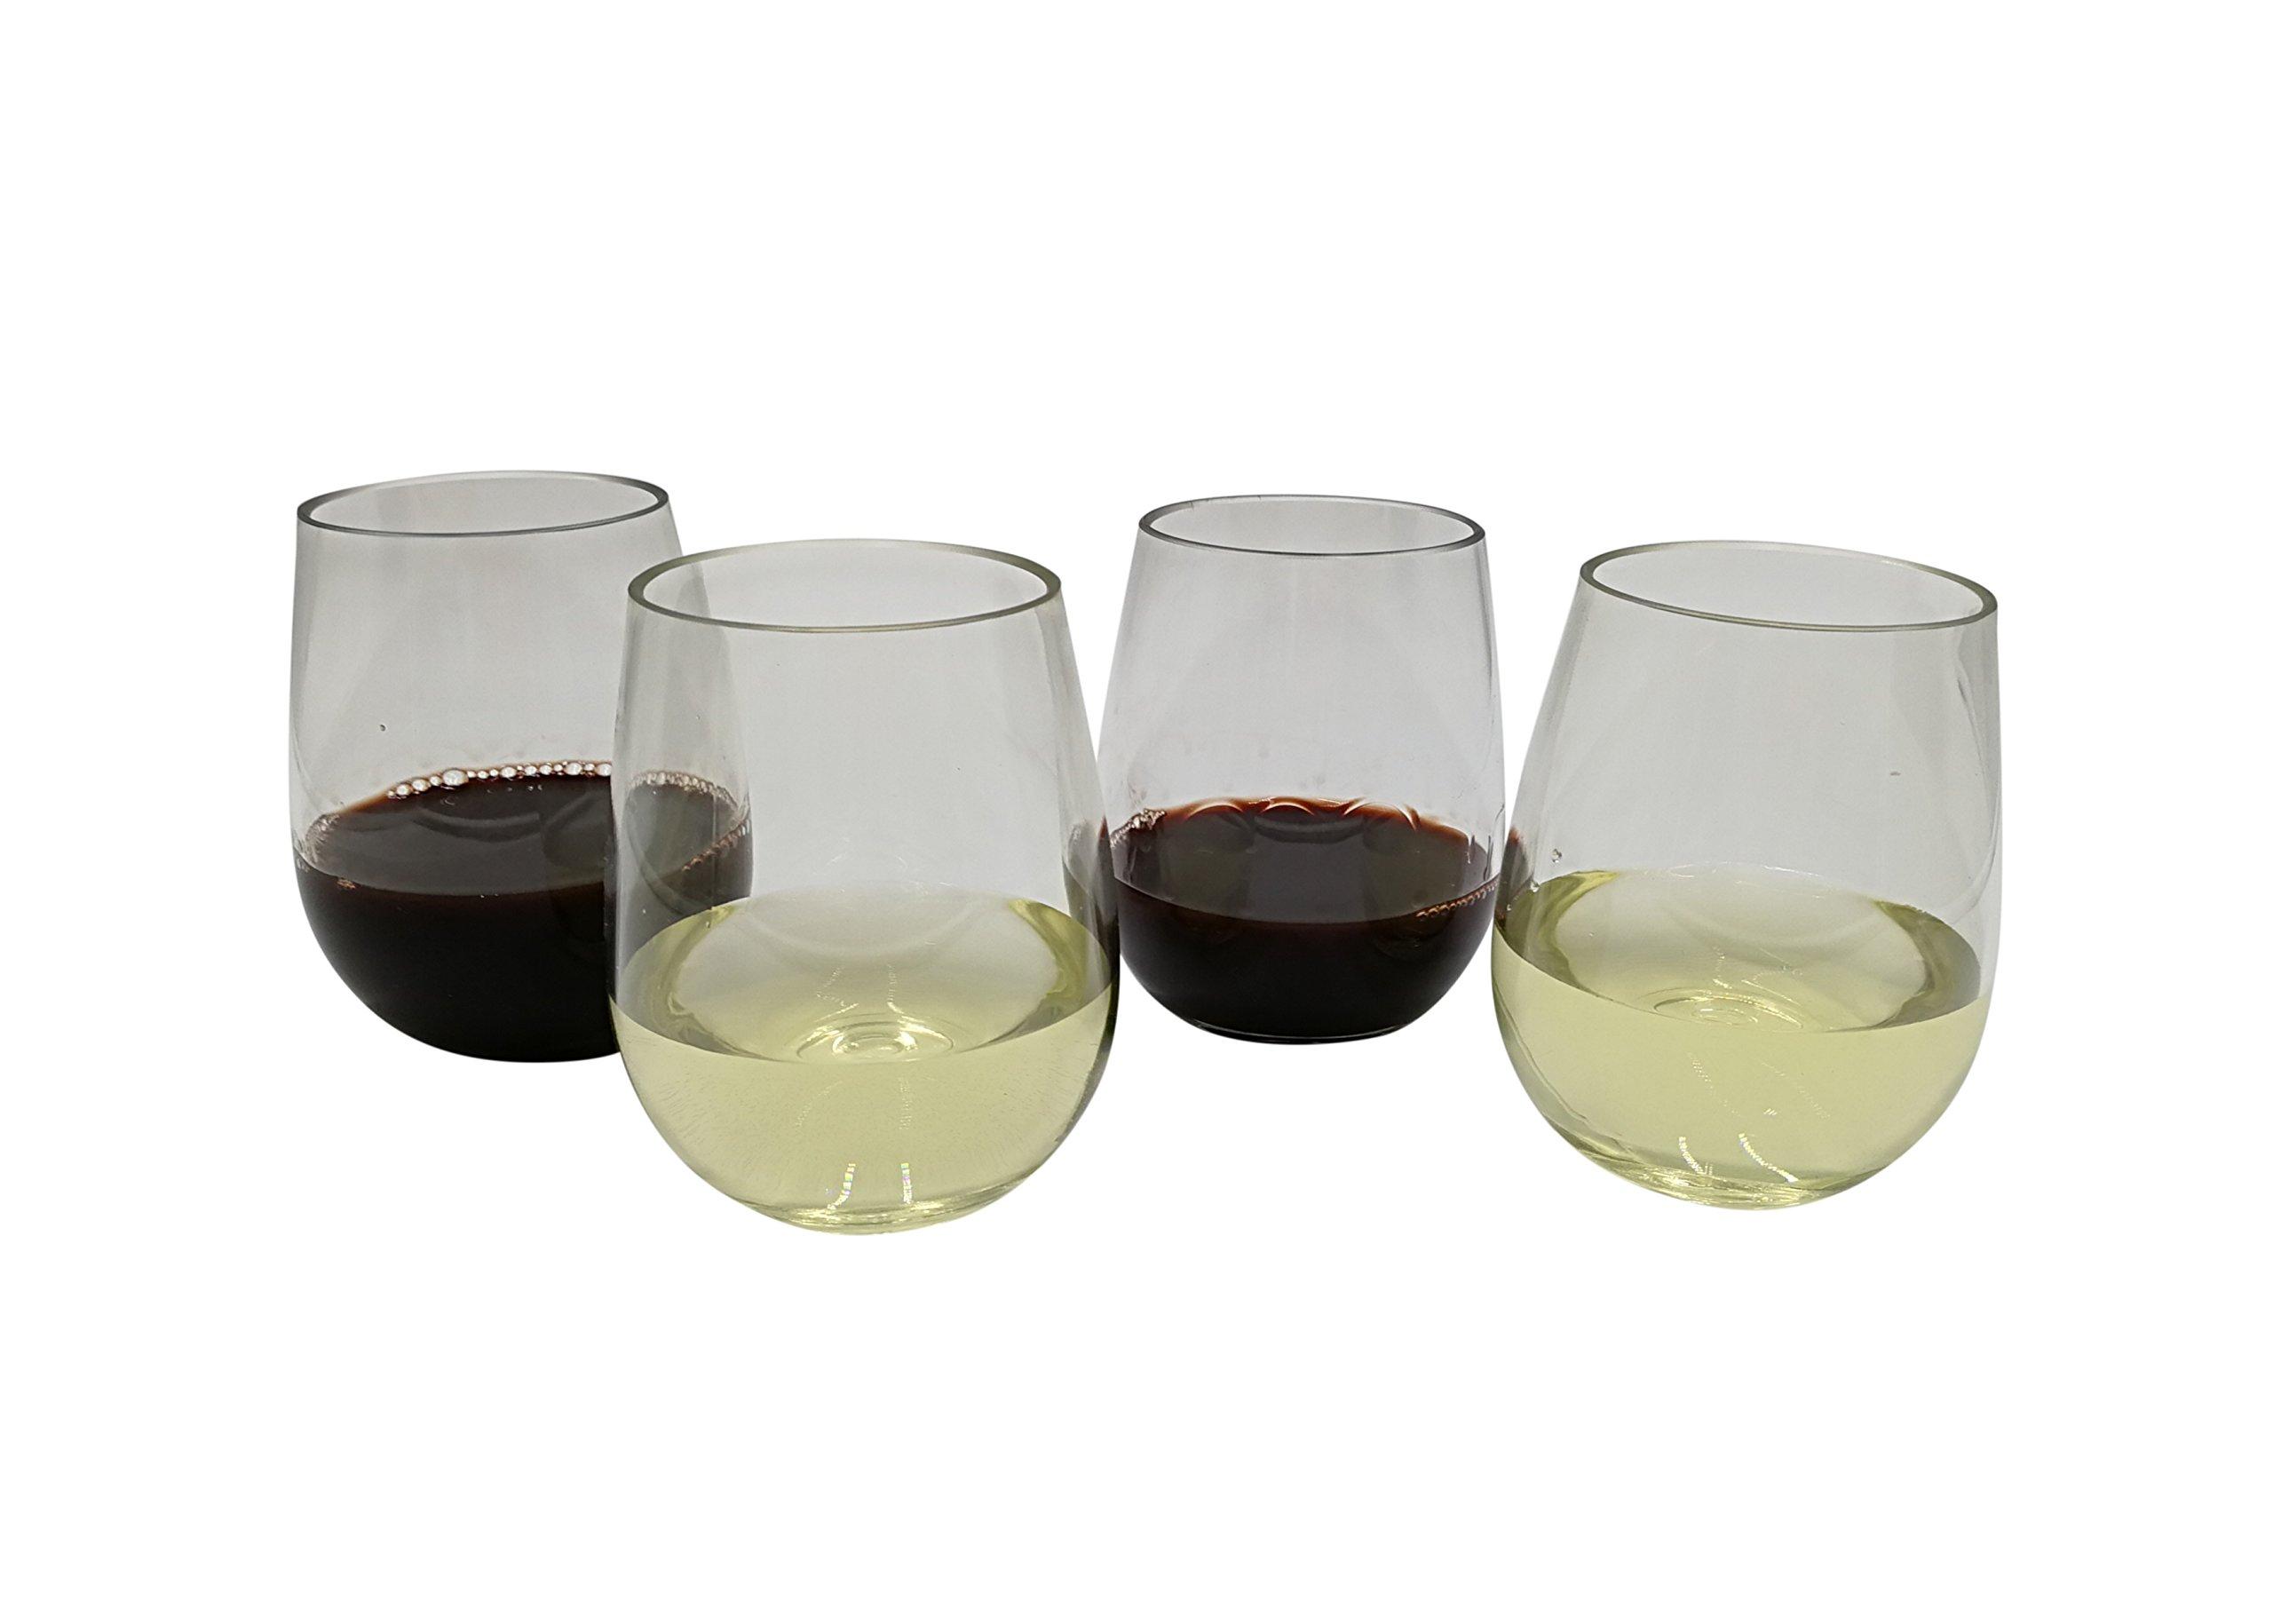 543527ac5d3 Cheap Plastic Wine Glass Wholesale, find Plastic Wine Glass ...